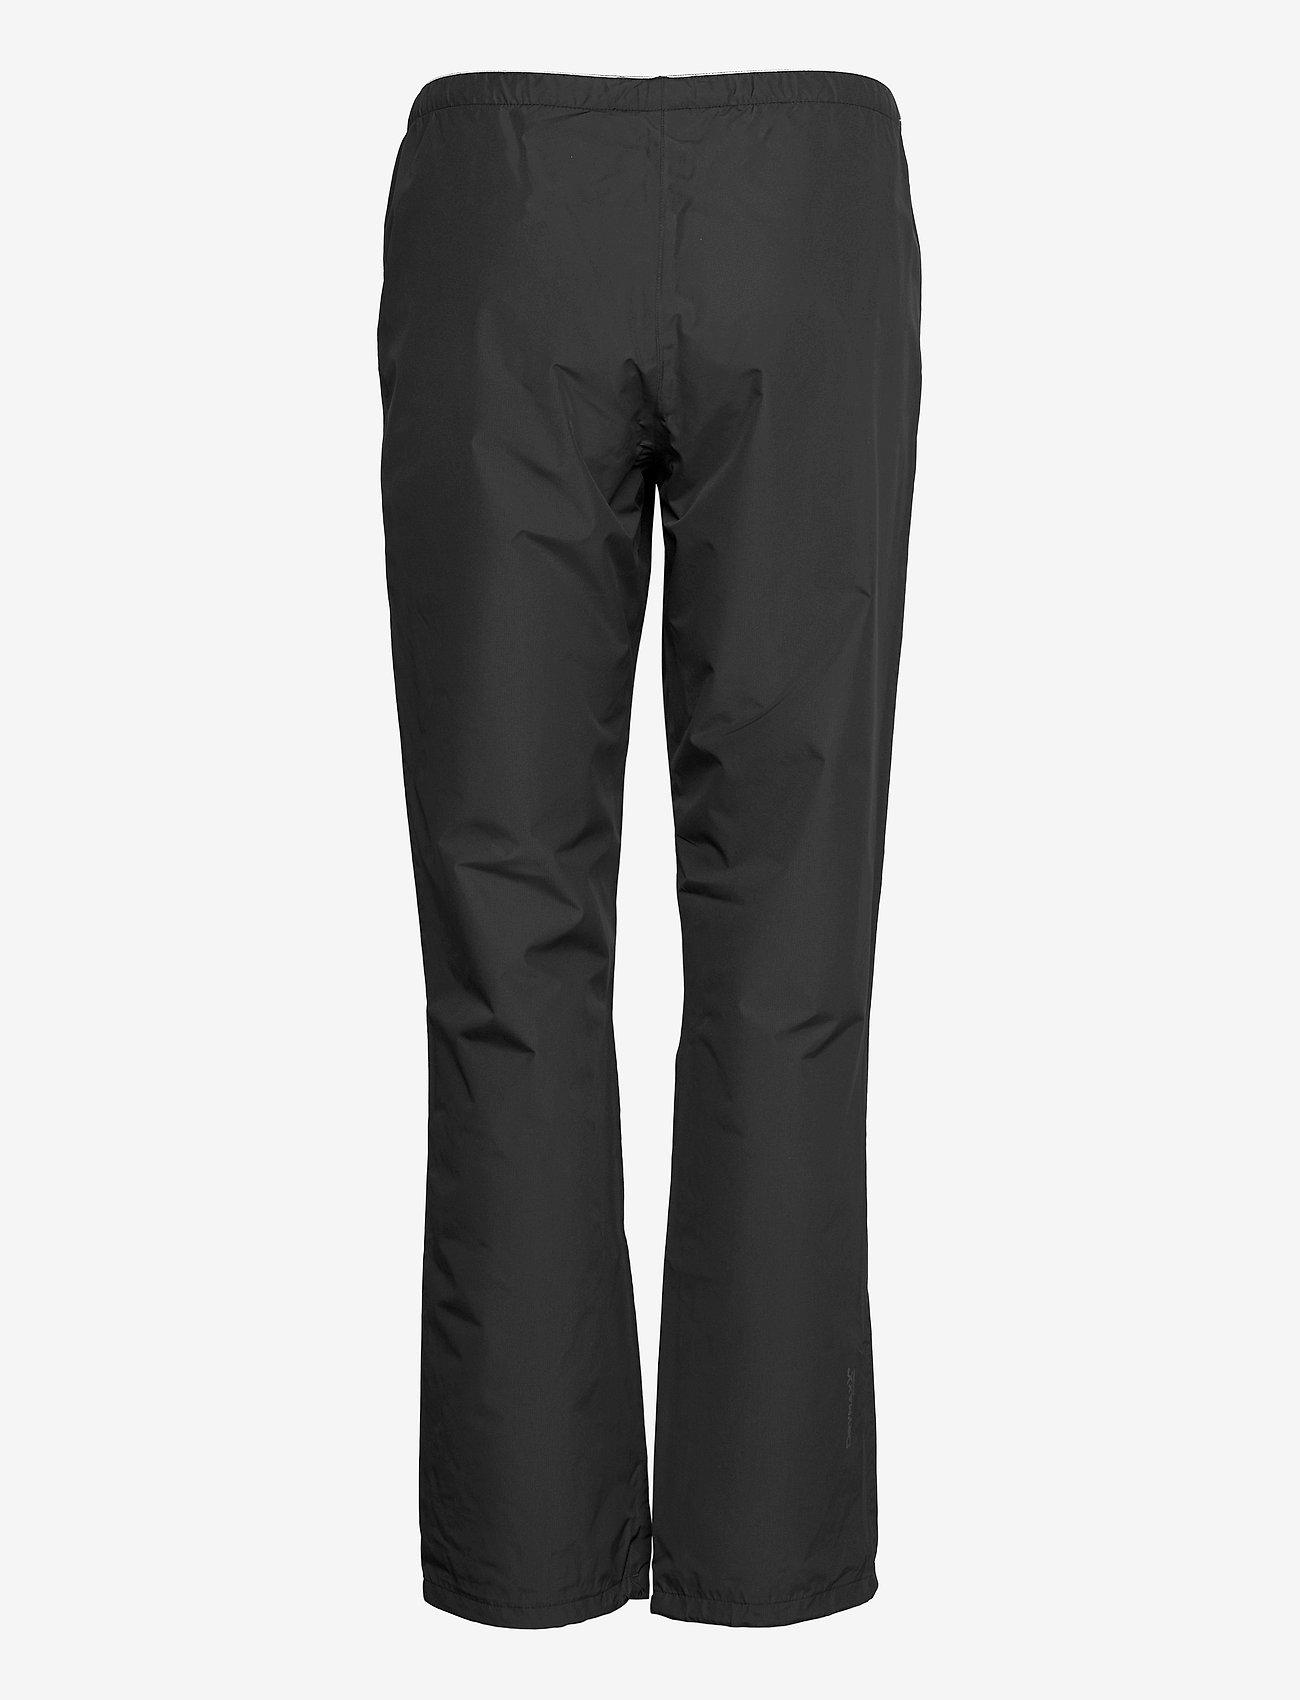 Halti - Fort Women's DrymaxX Shell Pants - friluftsbukser - black - 1